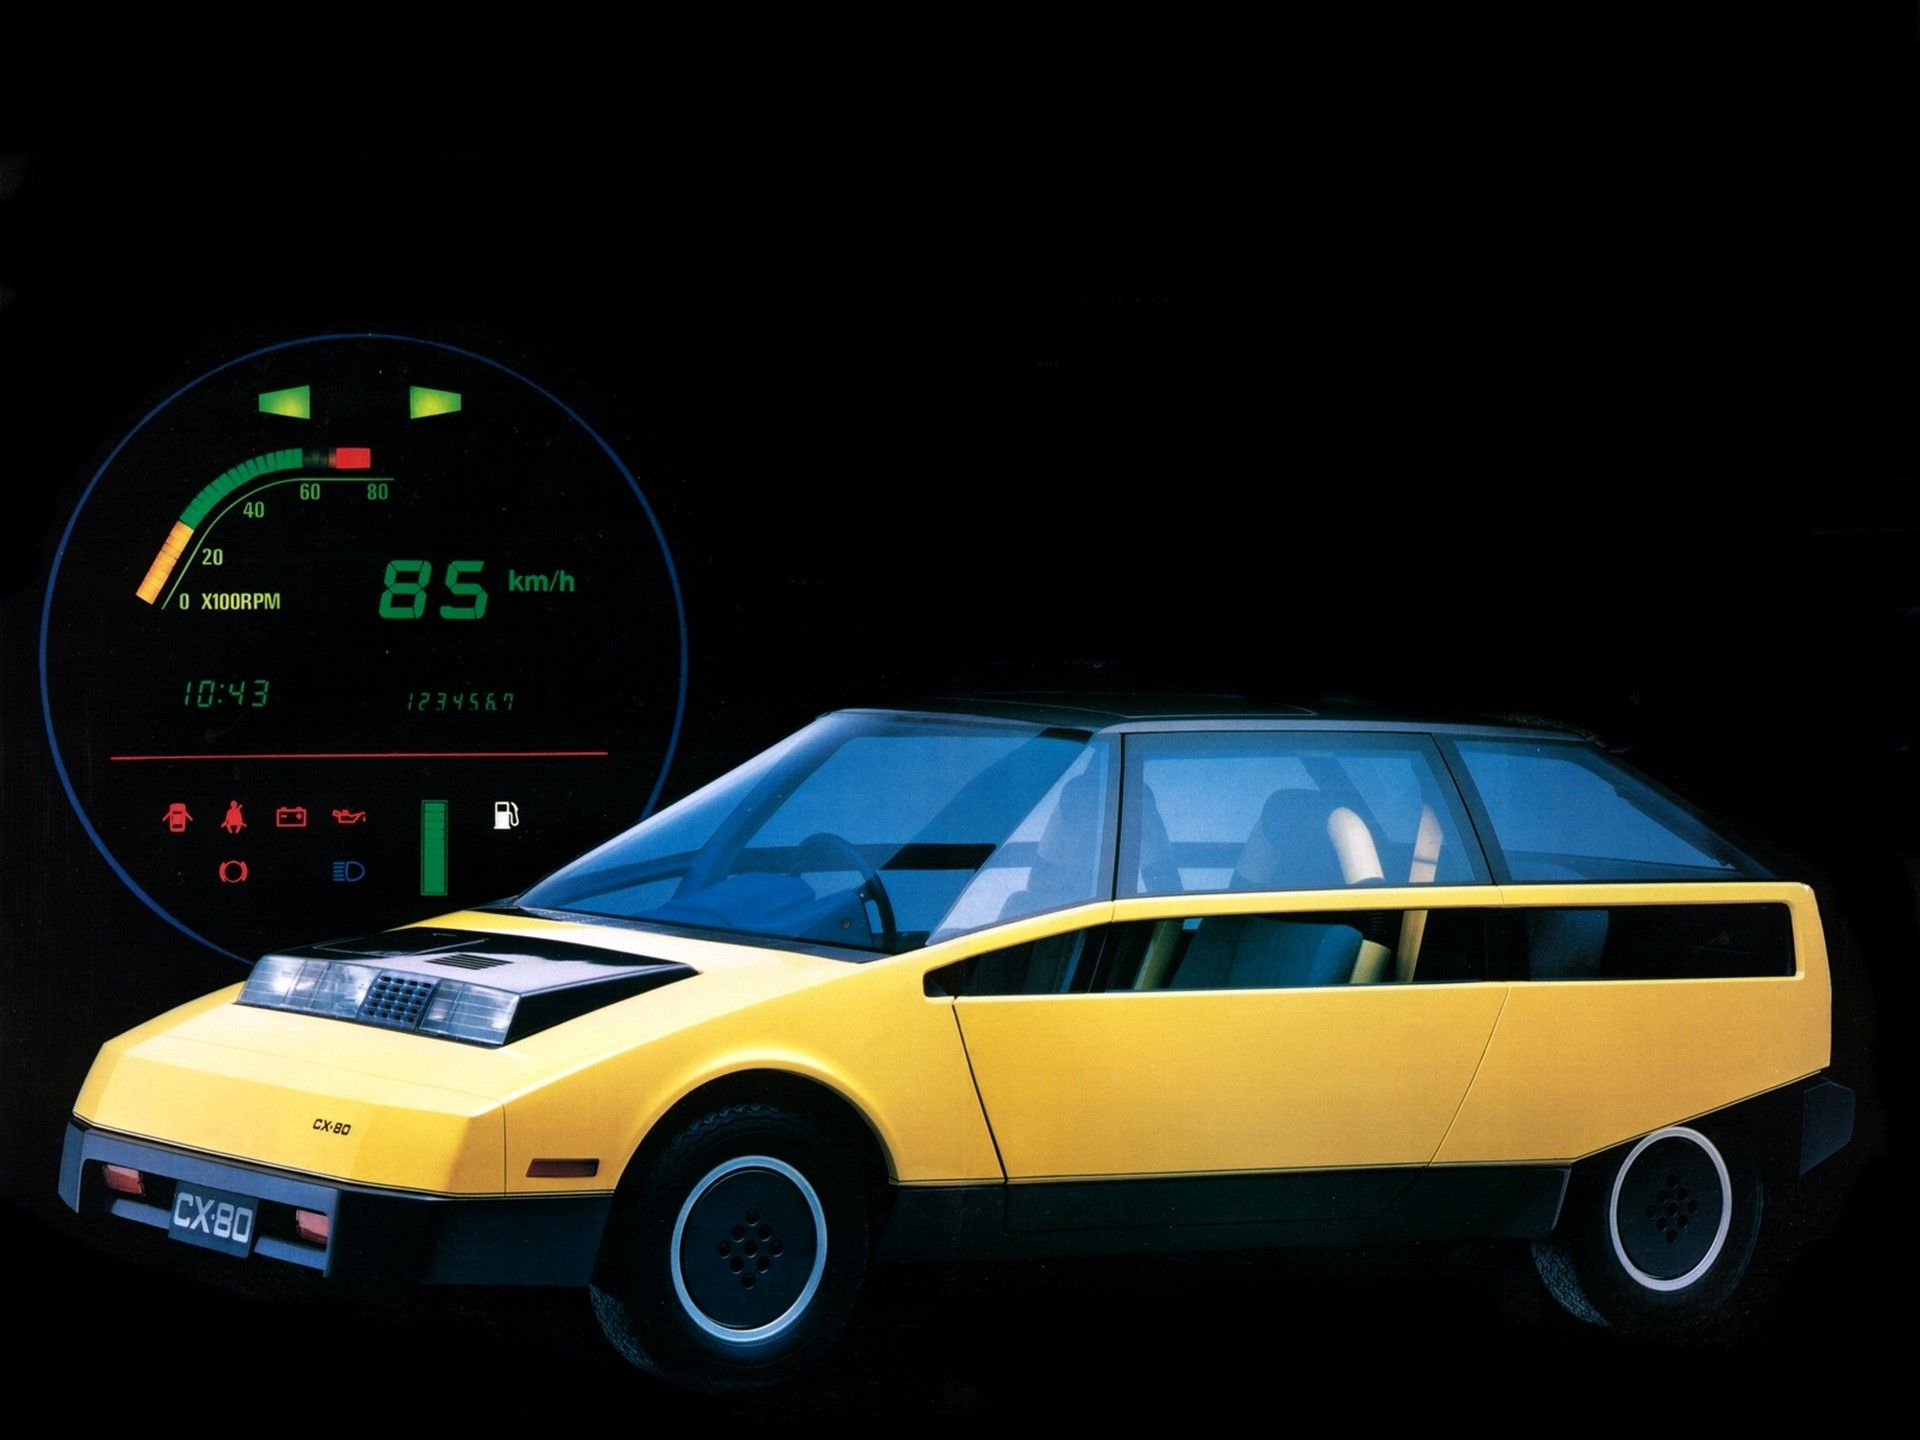 Toyota-CX-80-Concept-1979-1